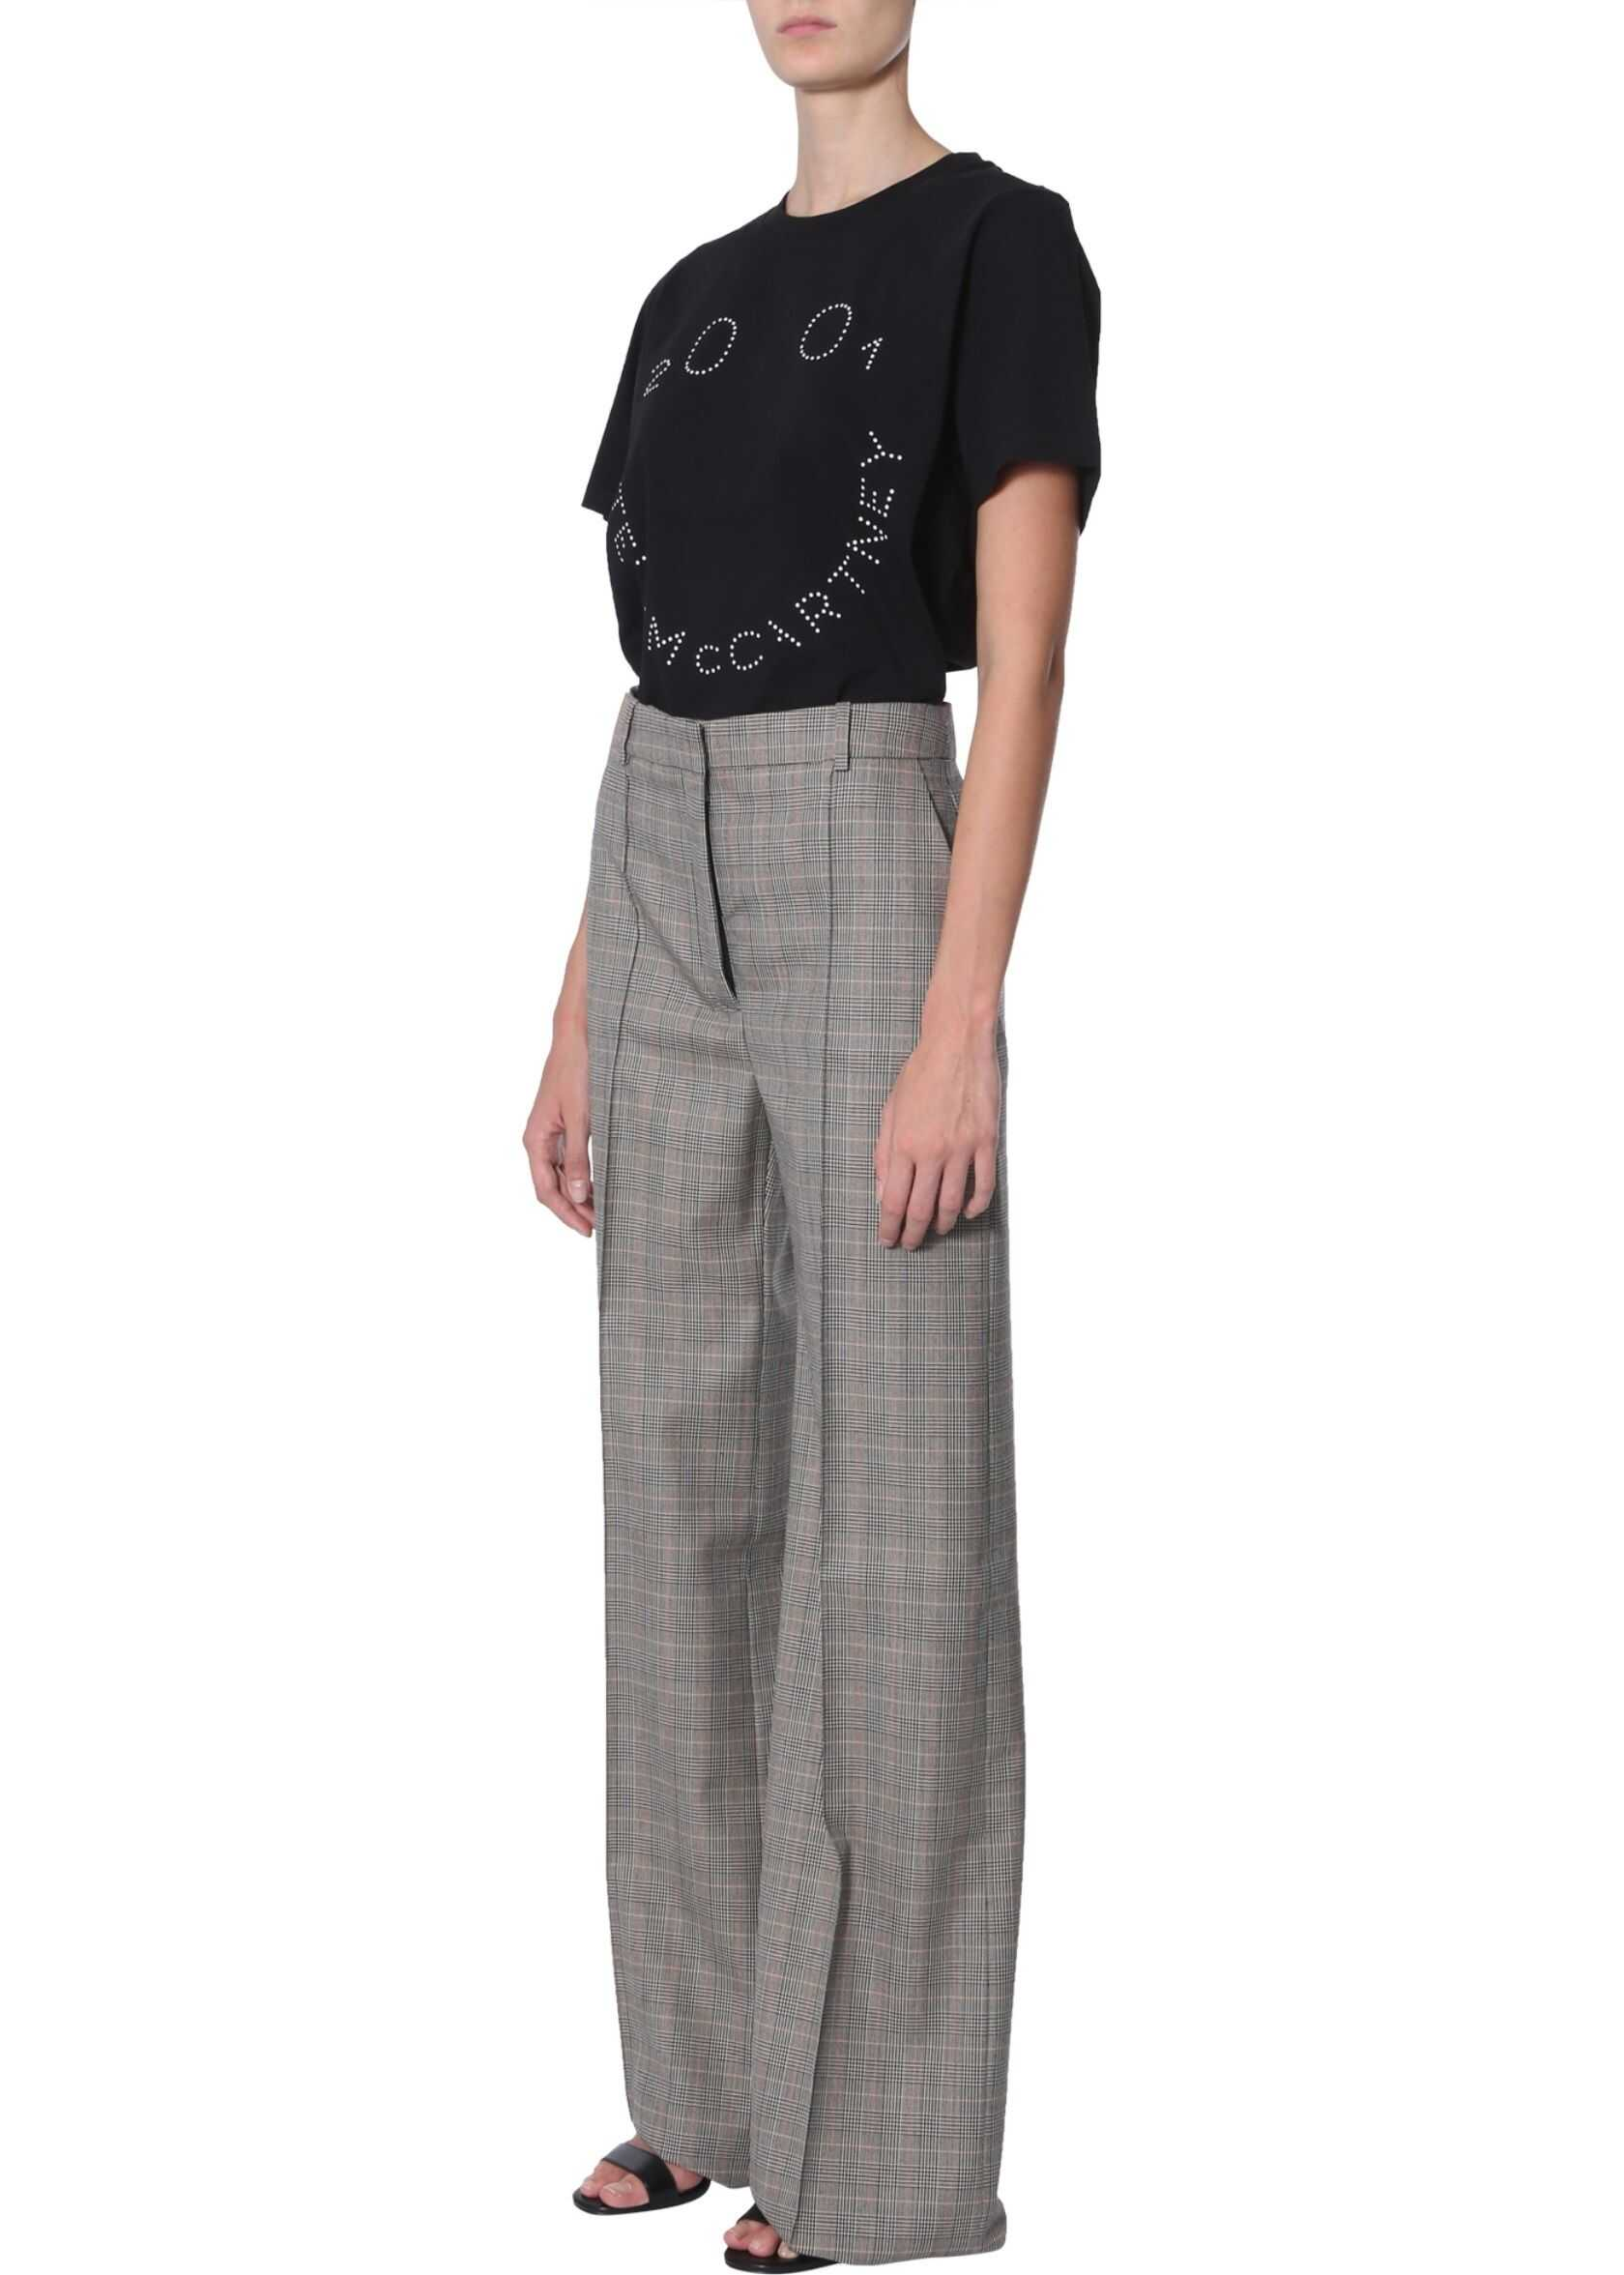 adidas by Stella McCartney T-Shirt With 2001 Logo Print BLACK